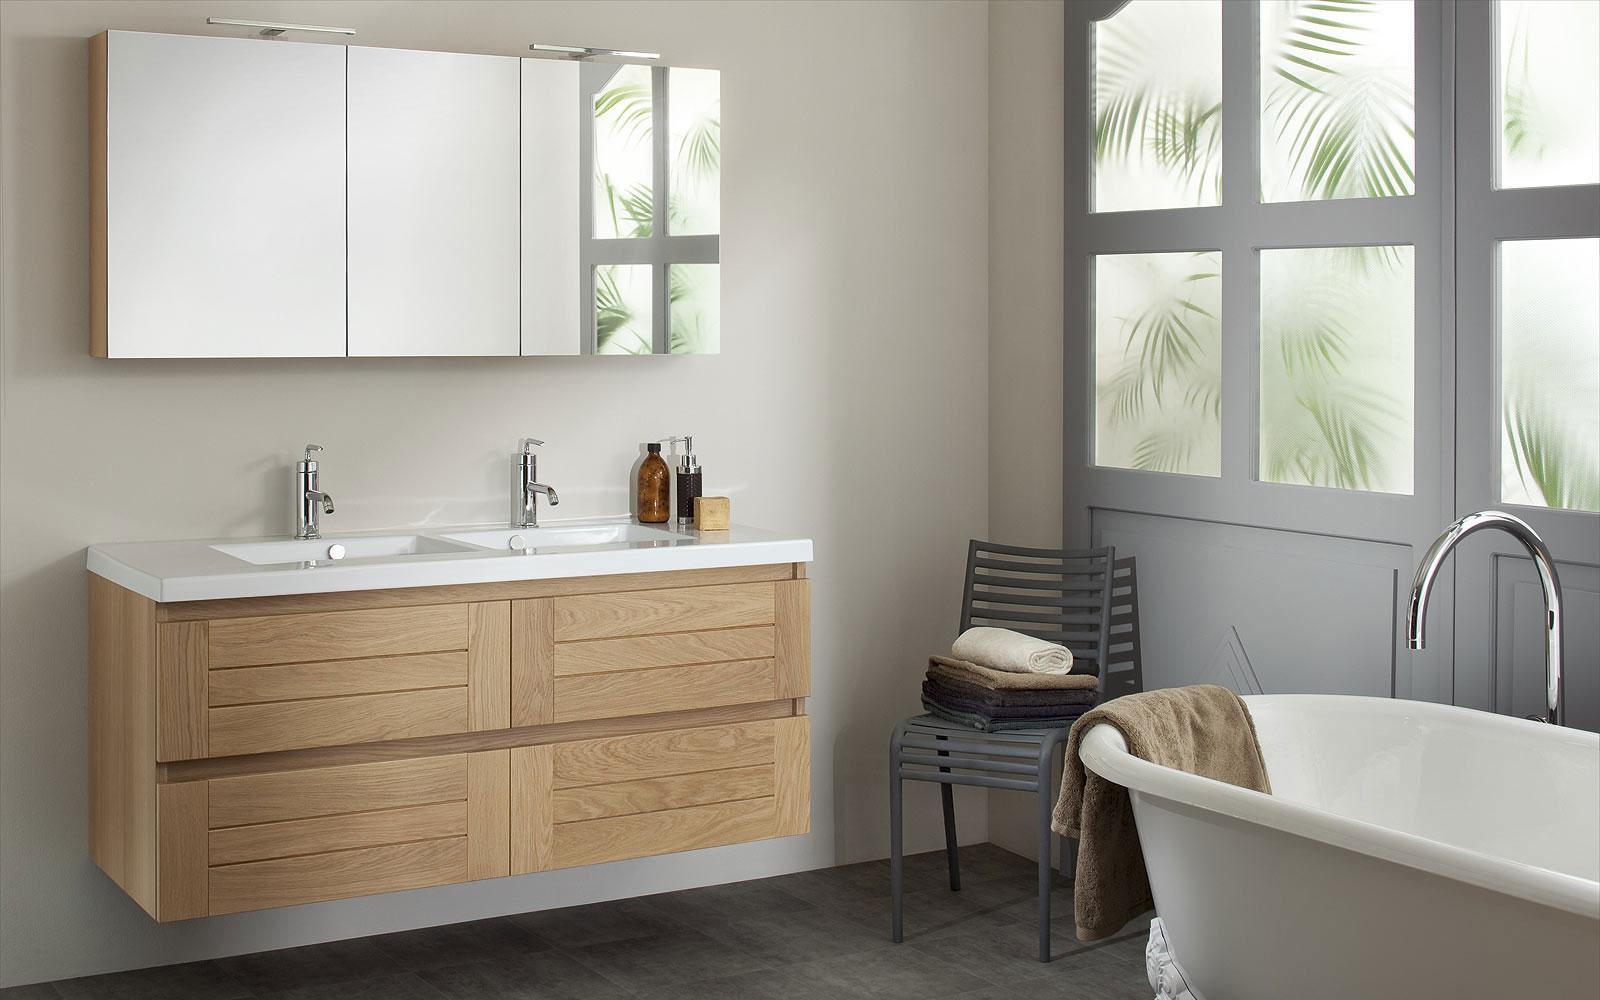 Salles de bains for Baudet salle de bain